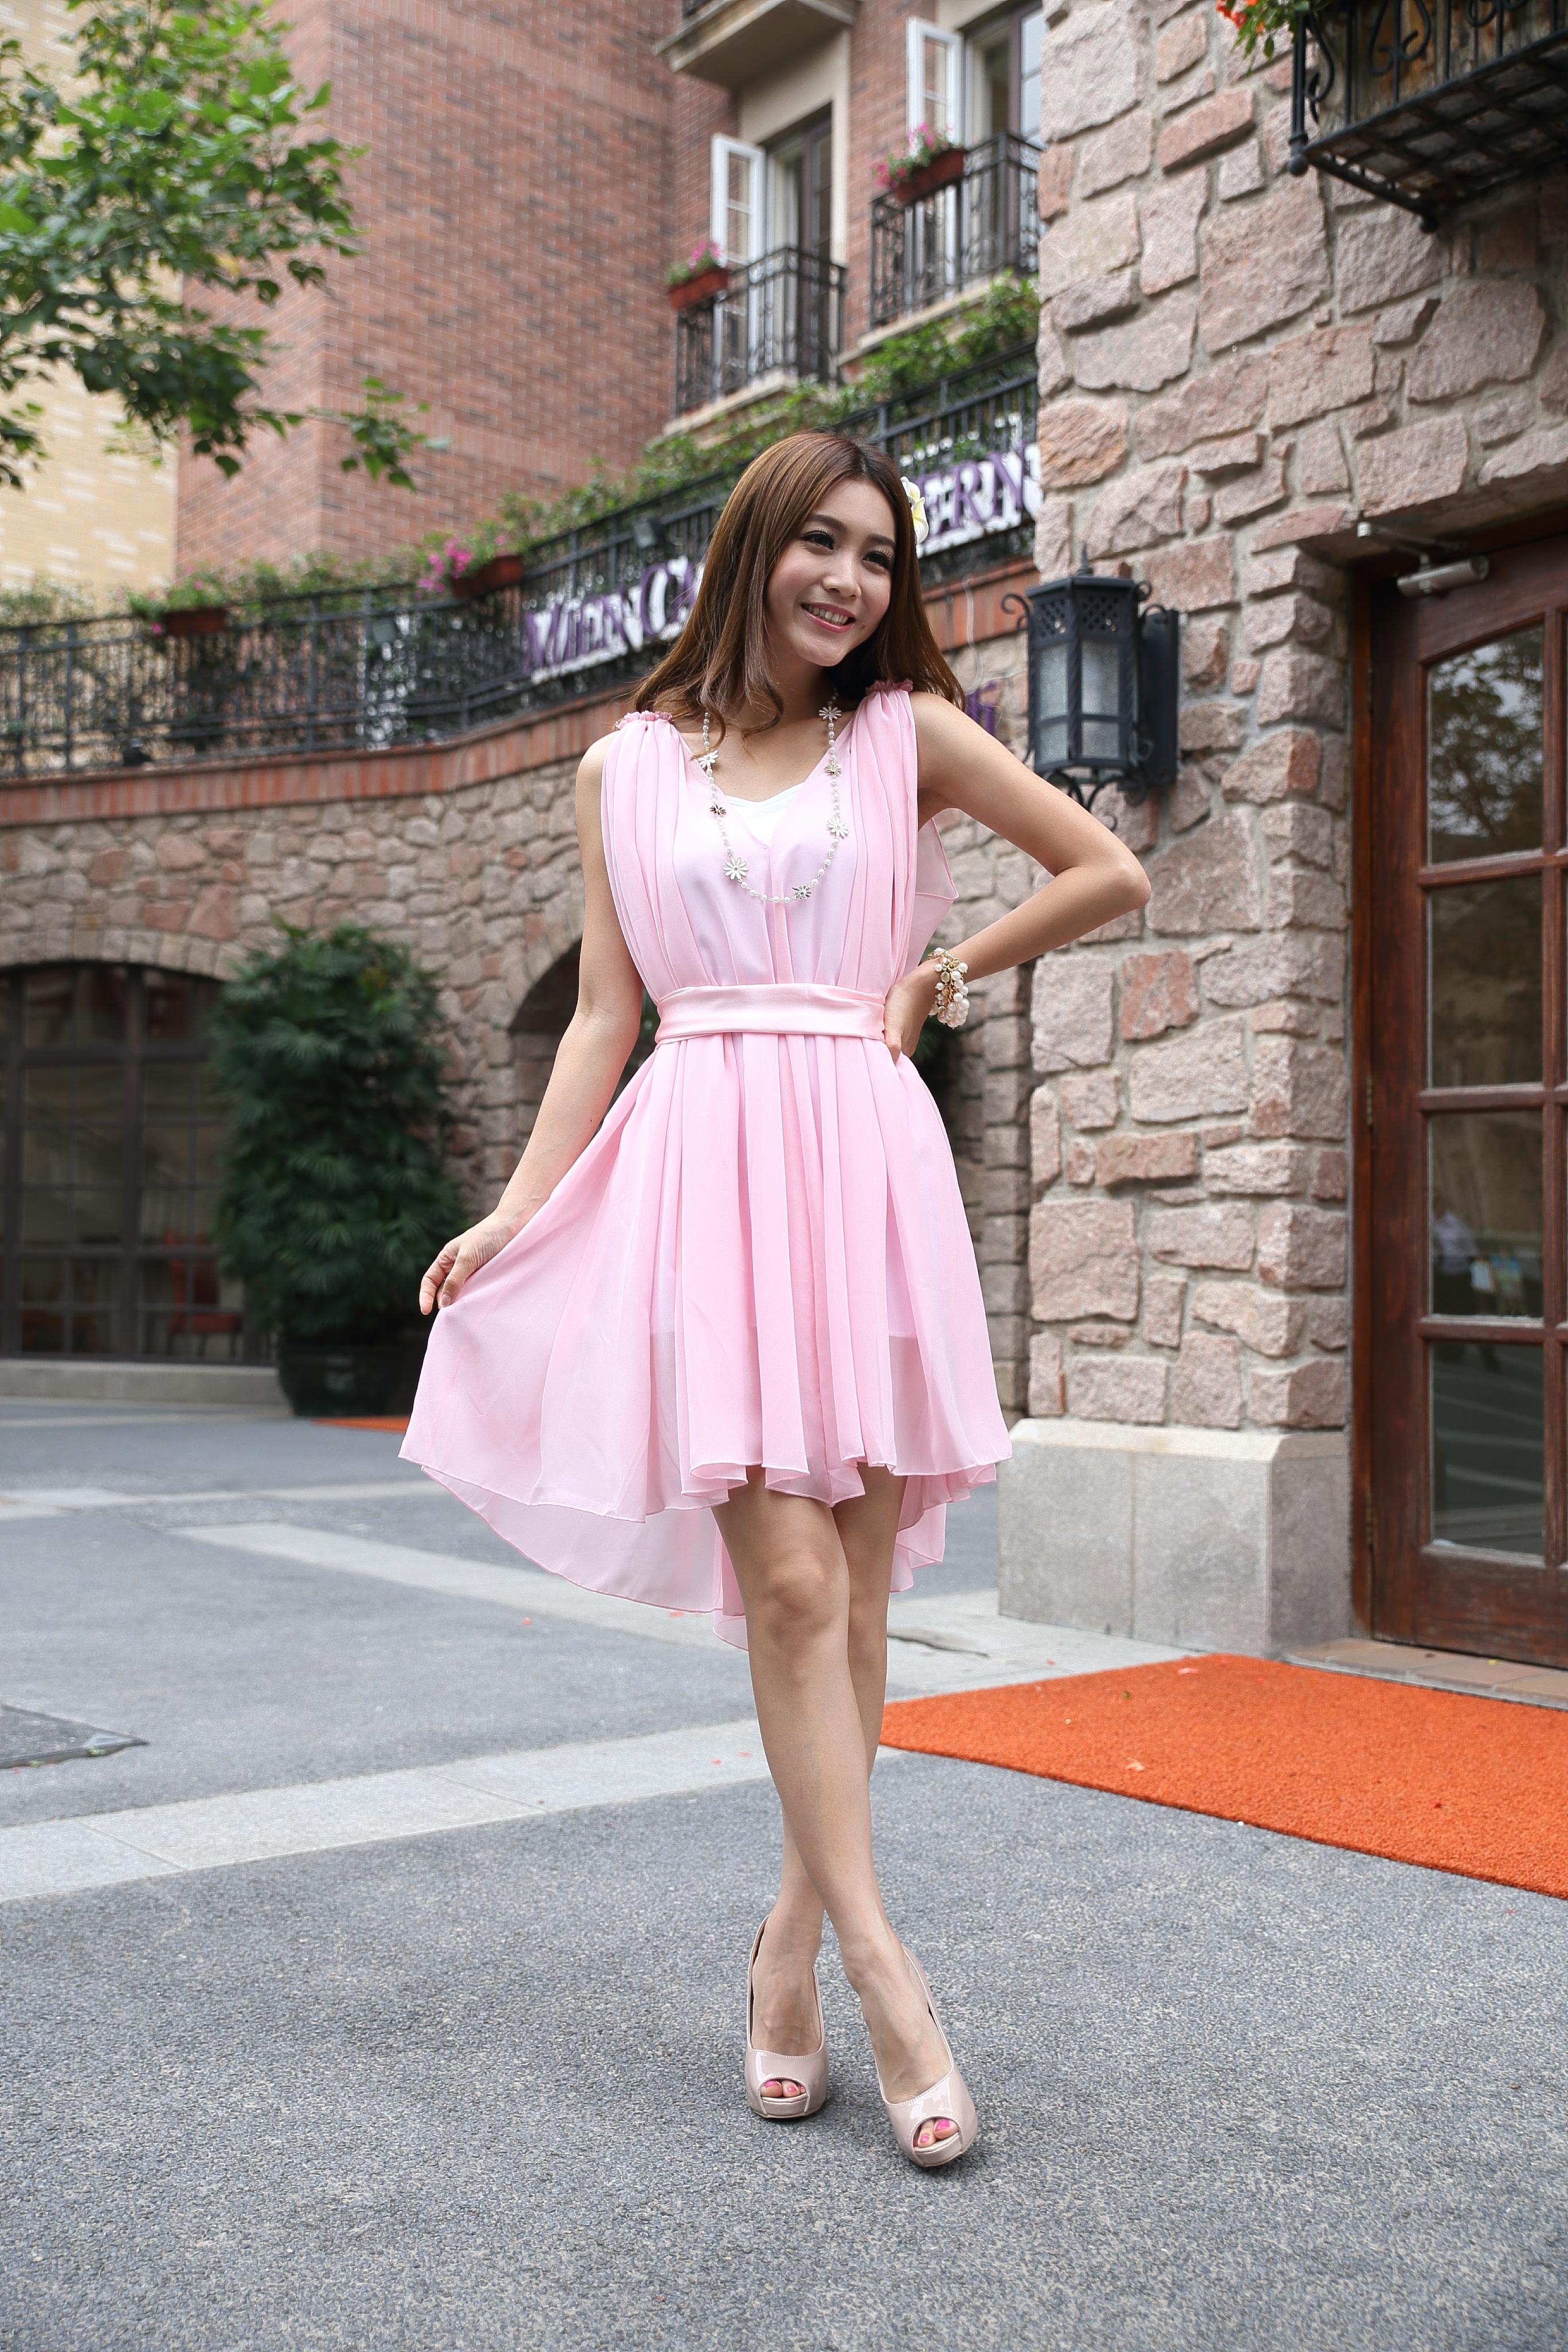 Fotos gratis : mujer, pierna, patrón, modelo, joven, primavera, Asia ...